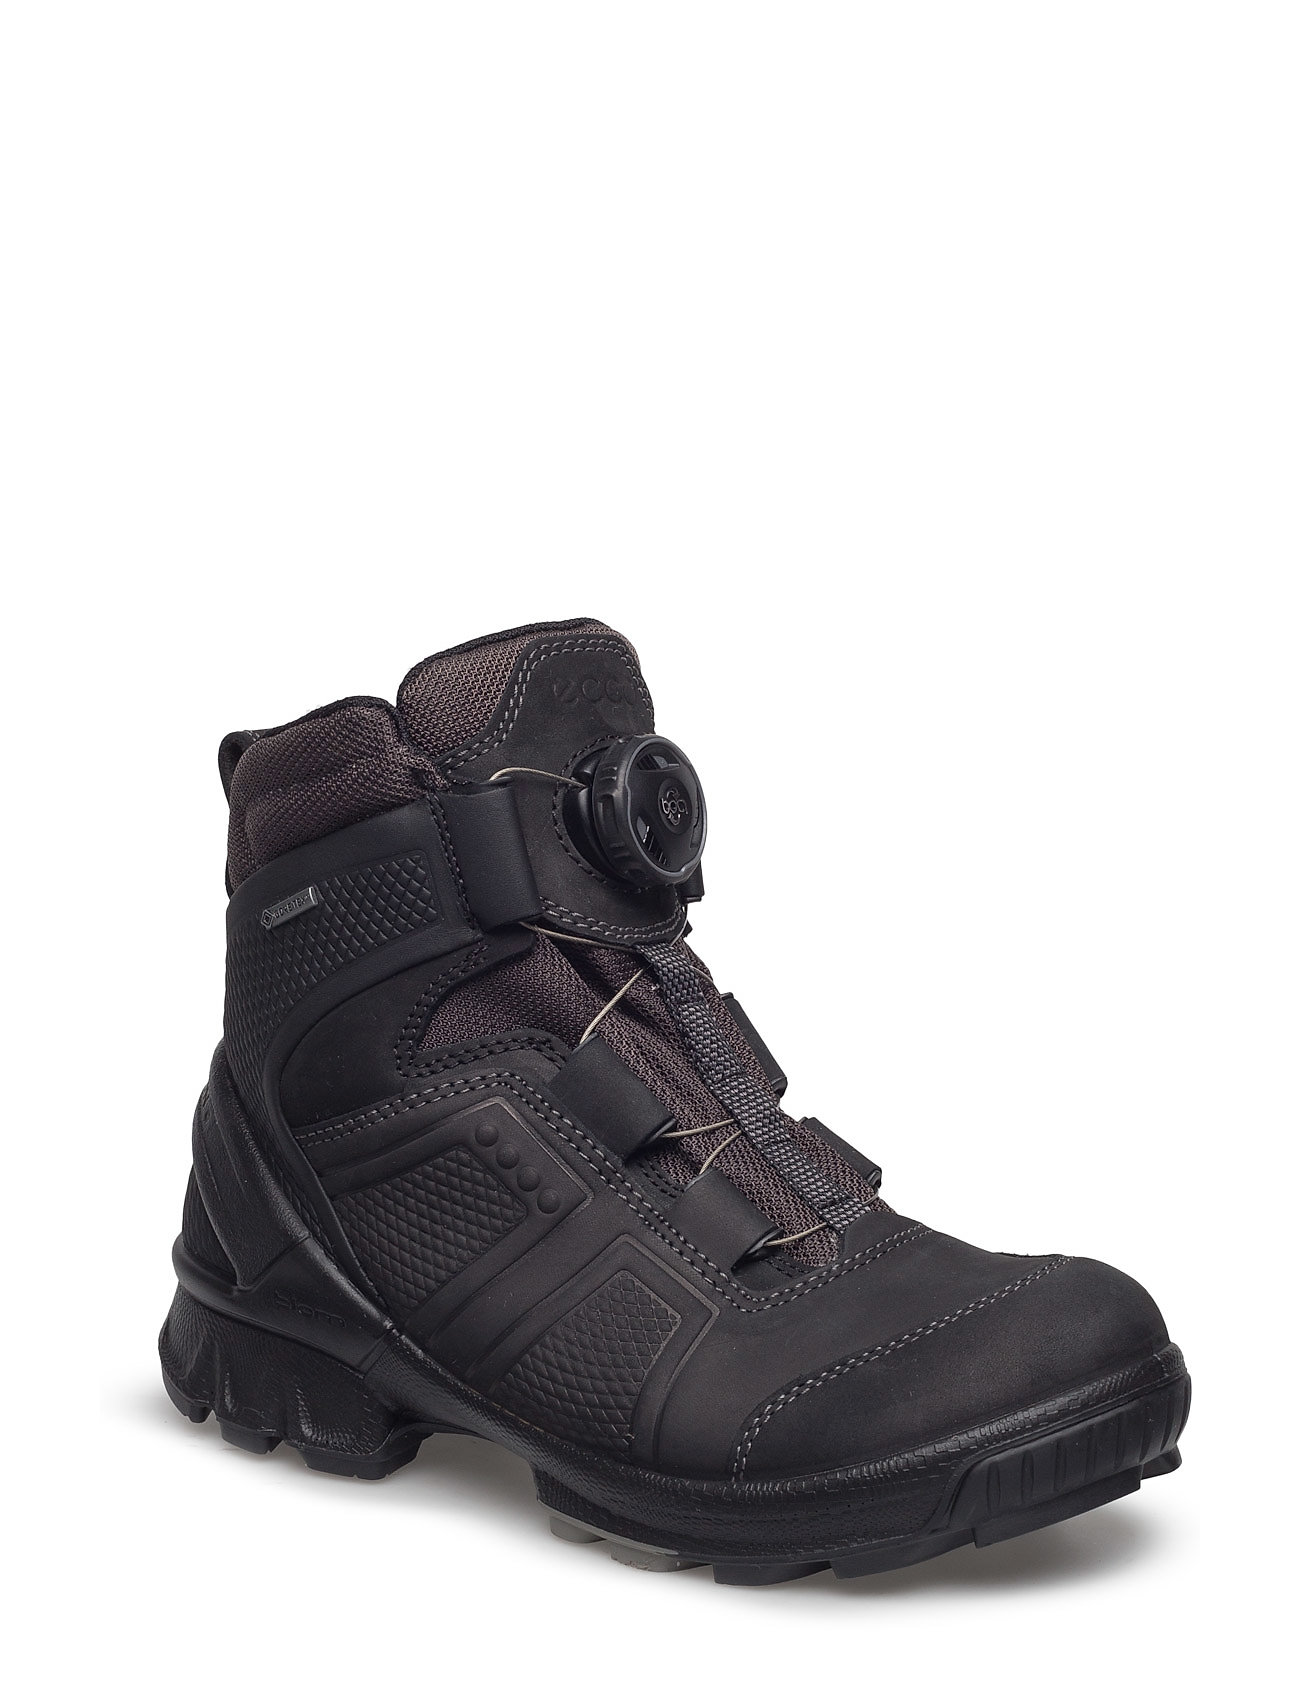 Biom Hike ECCO Støvler til Damer i